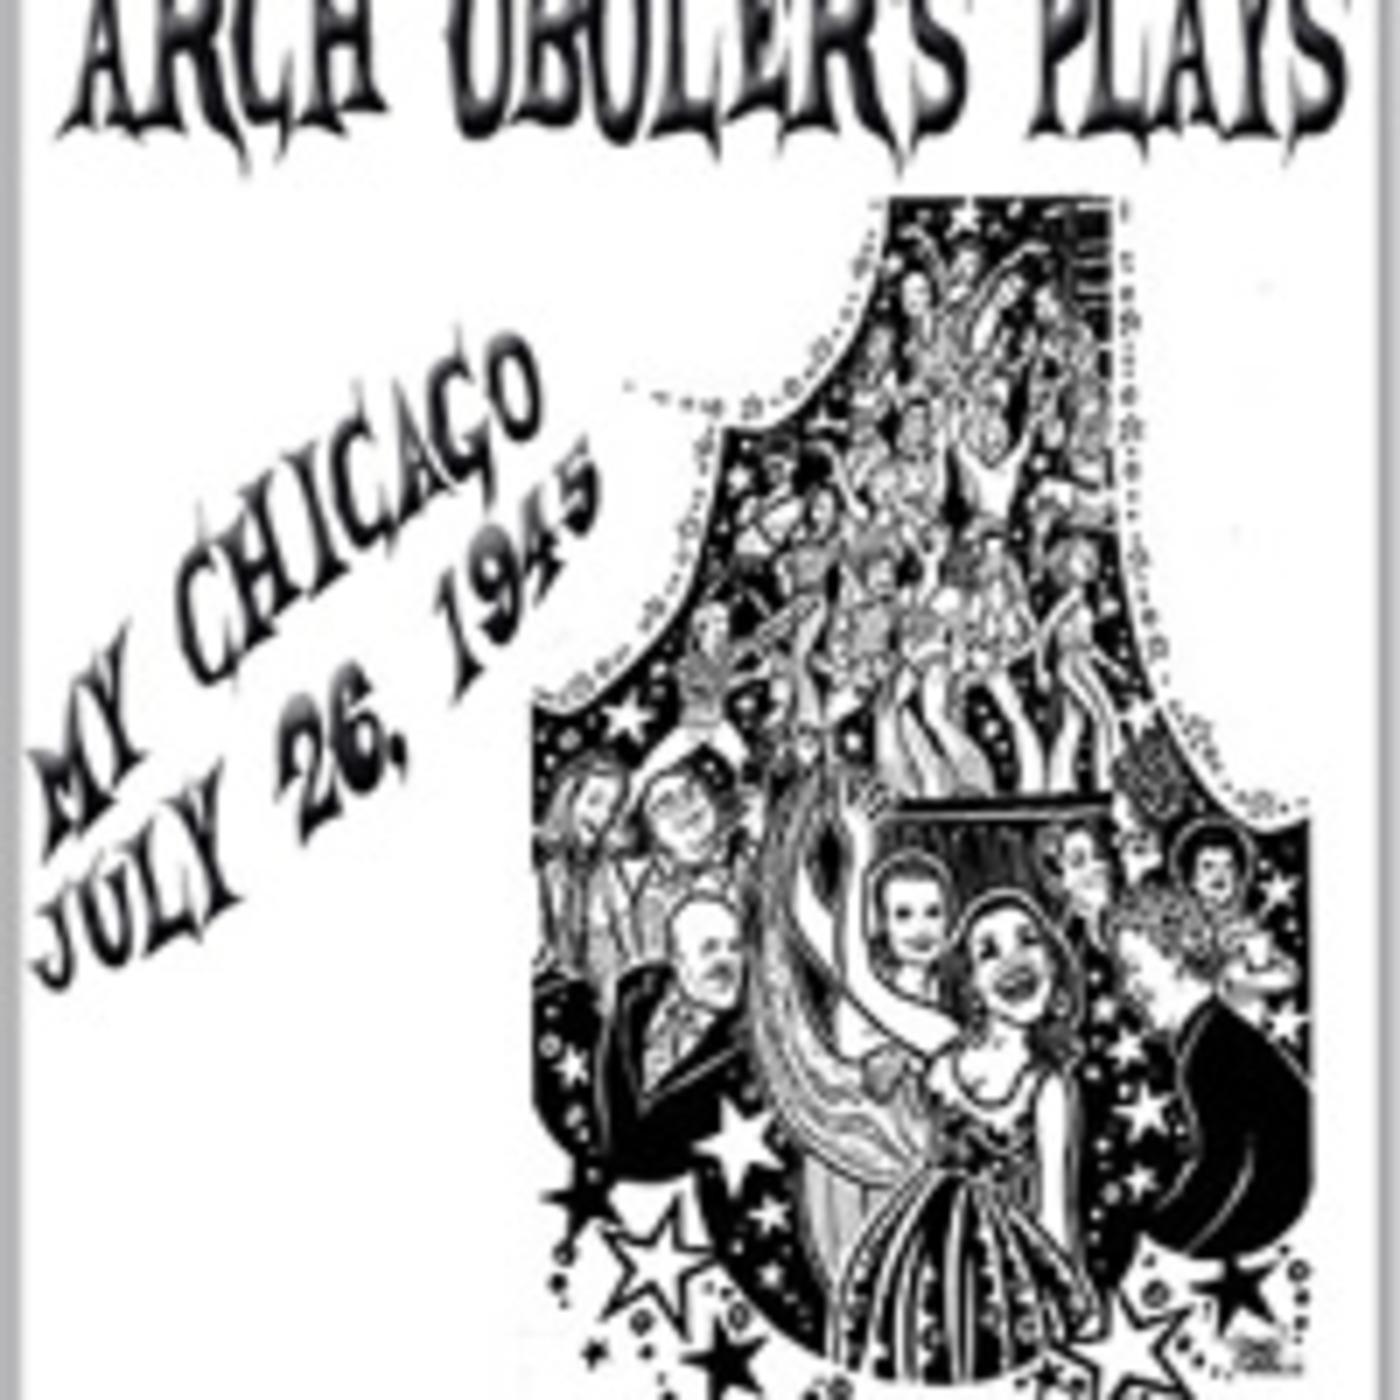 Arch Oboler's Plays - My Chicago (07-26-45)